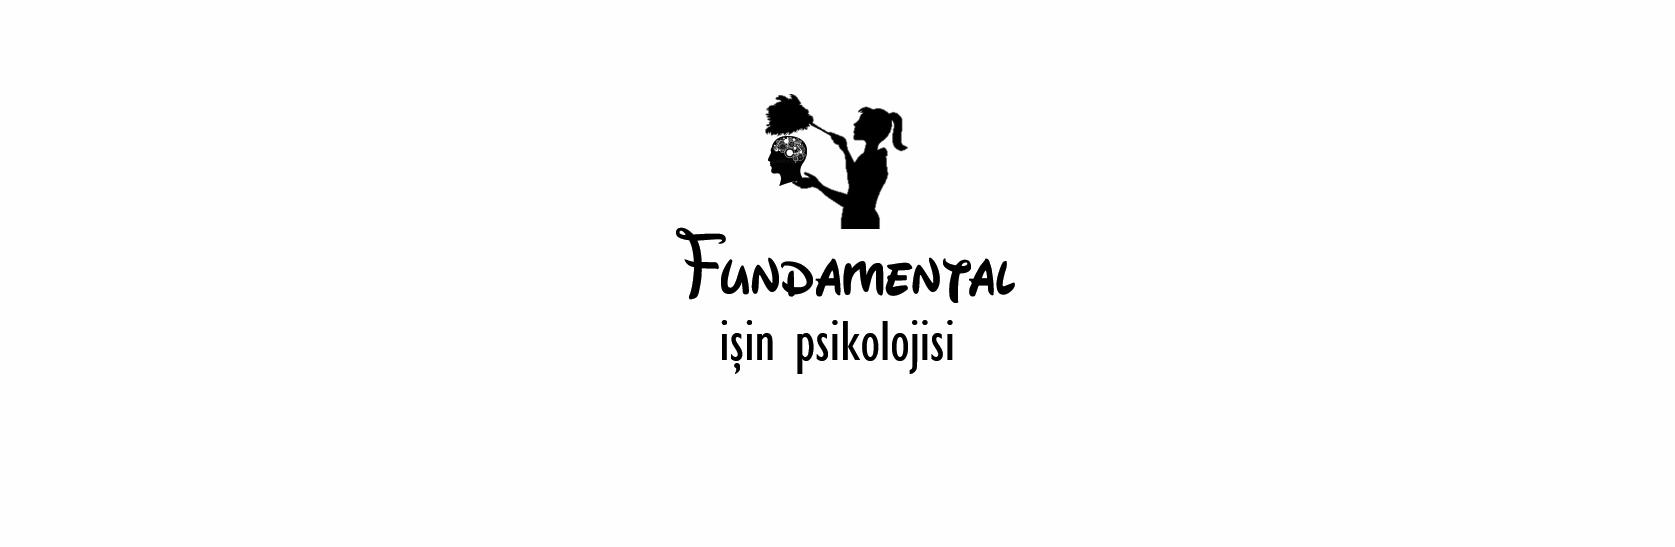 fundamentalisinpsikolojisi